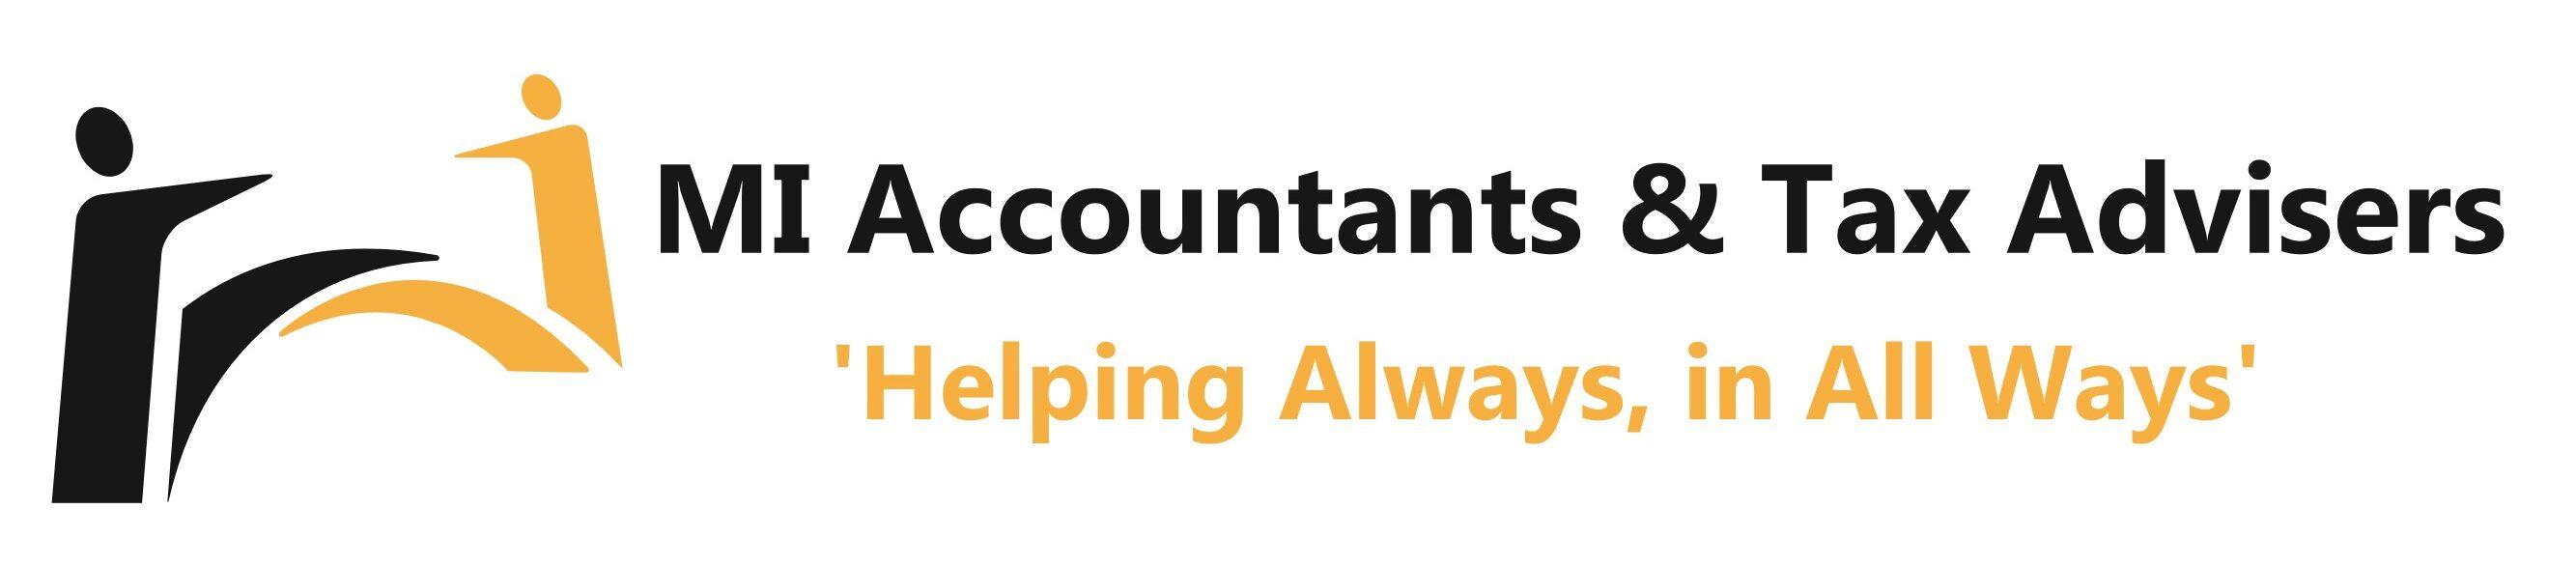 MI Accountants and Tax Advisers